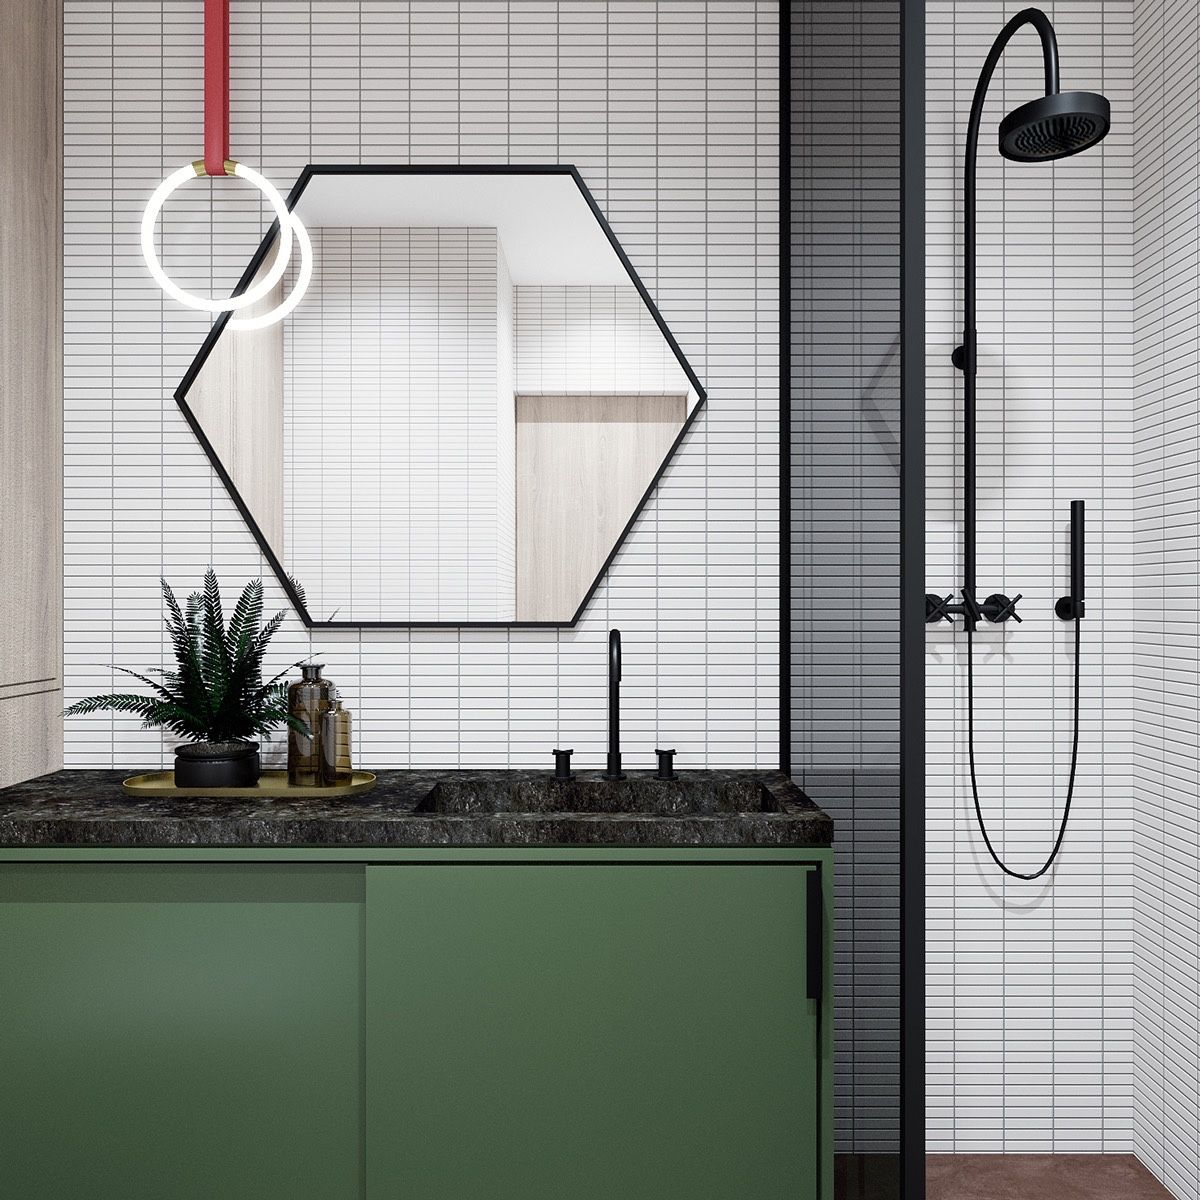 Small Apartment Design Under 600 Square Feet